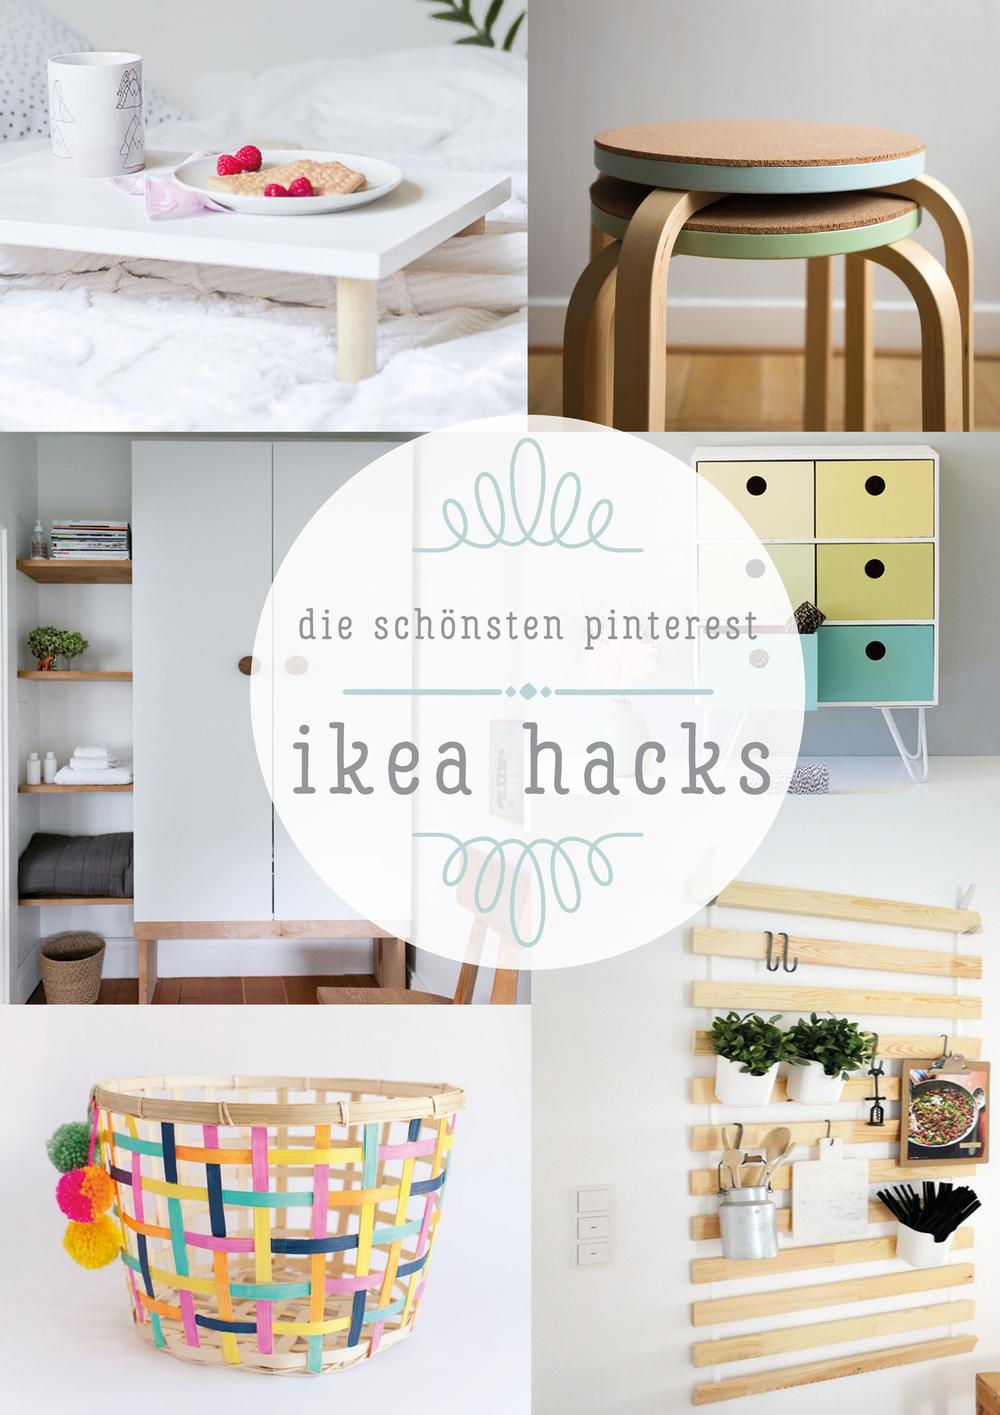 diy inspiration f r upcycler oder die sch nsten ikea hacks ninotschka. Black Bedroom Furniture Sets. Home Design Ideas